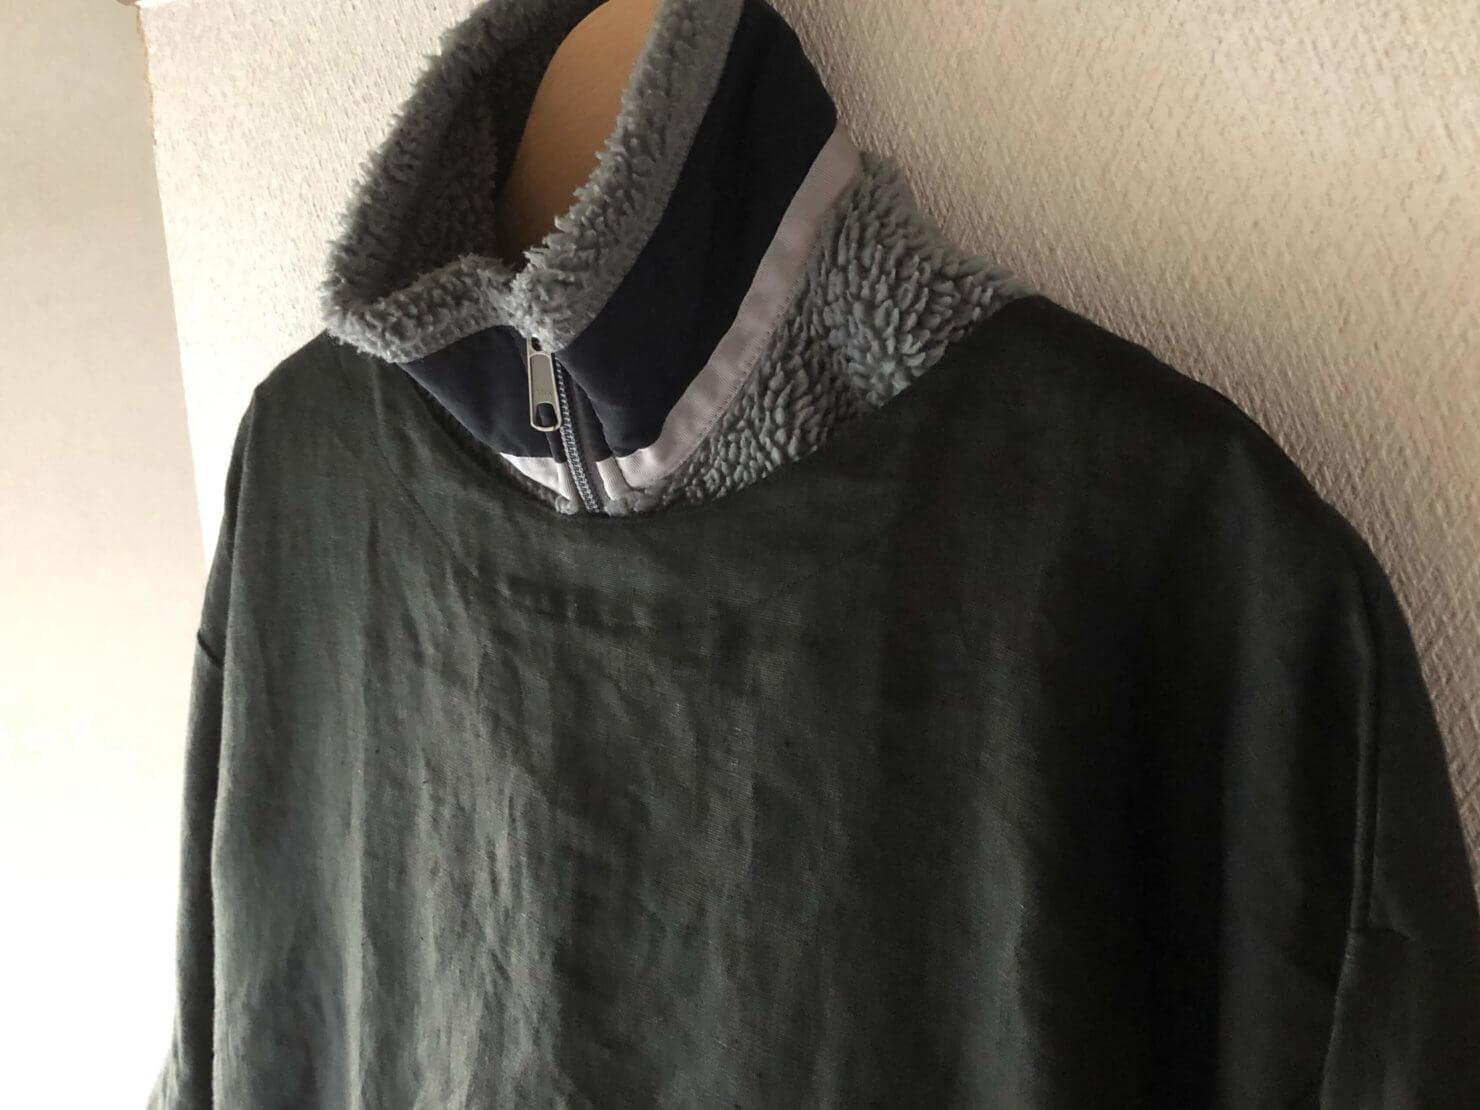 EARTH COLOR制作「黒リネン割烹着」厚手の服の上にも着れます